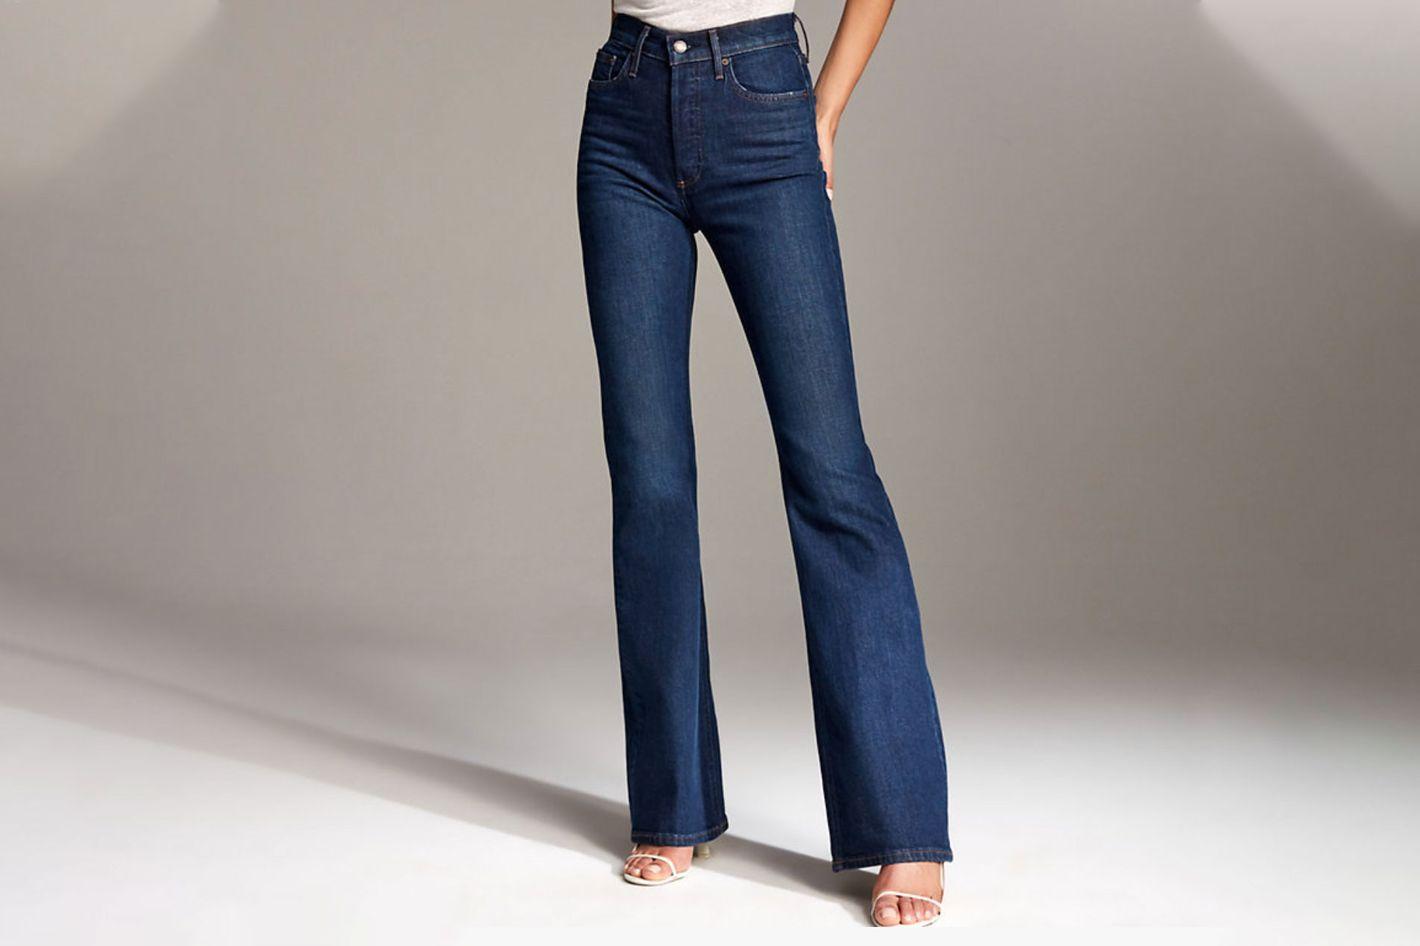 Aritzia the Marianne Flare High-Waisted Flare Jean